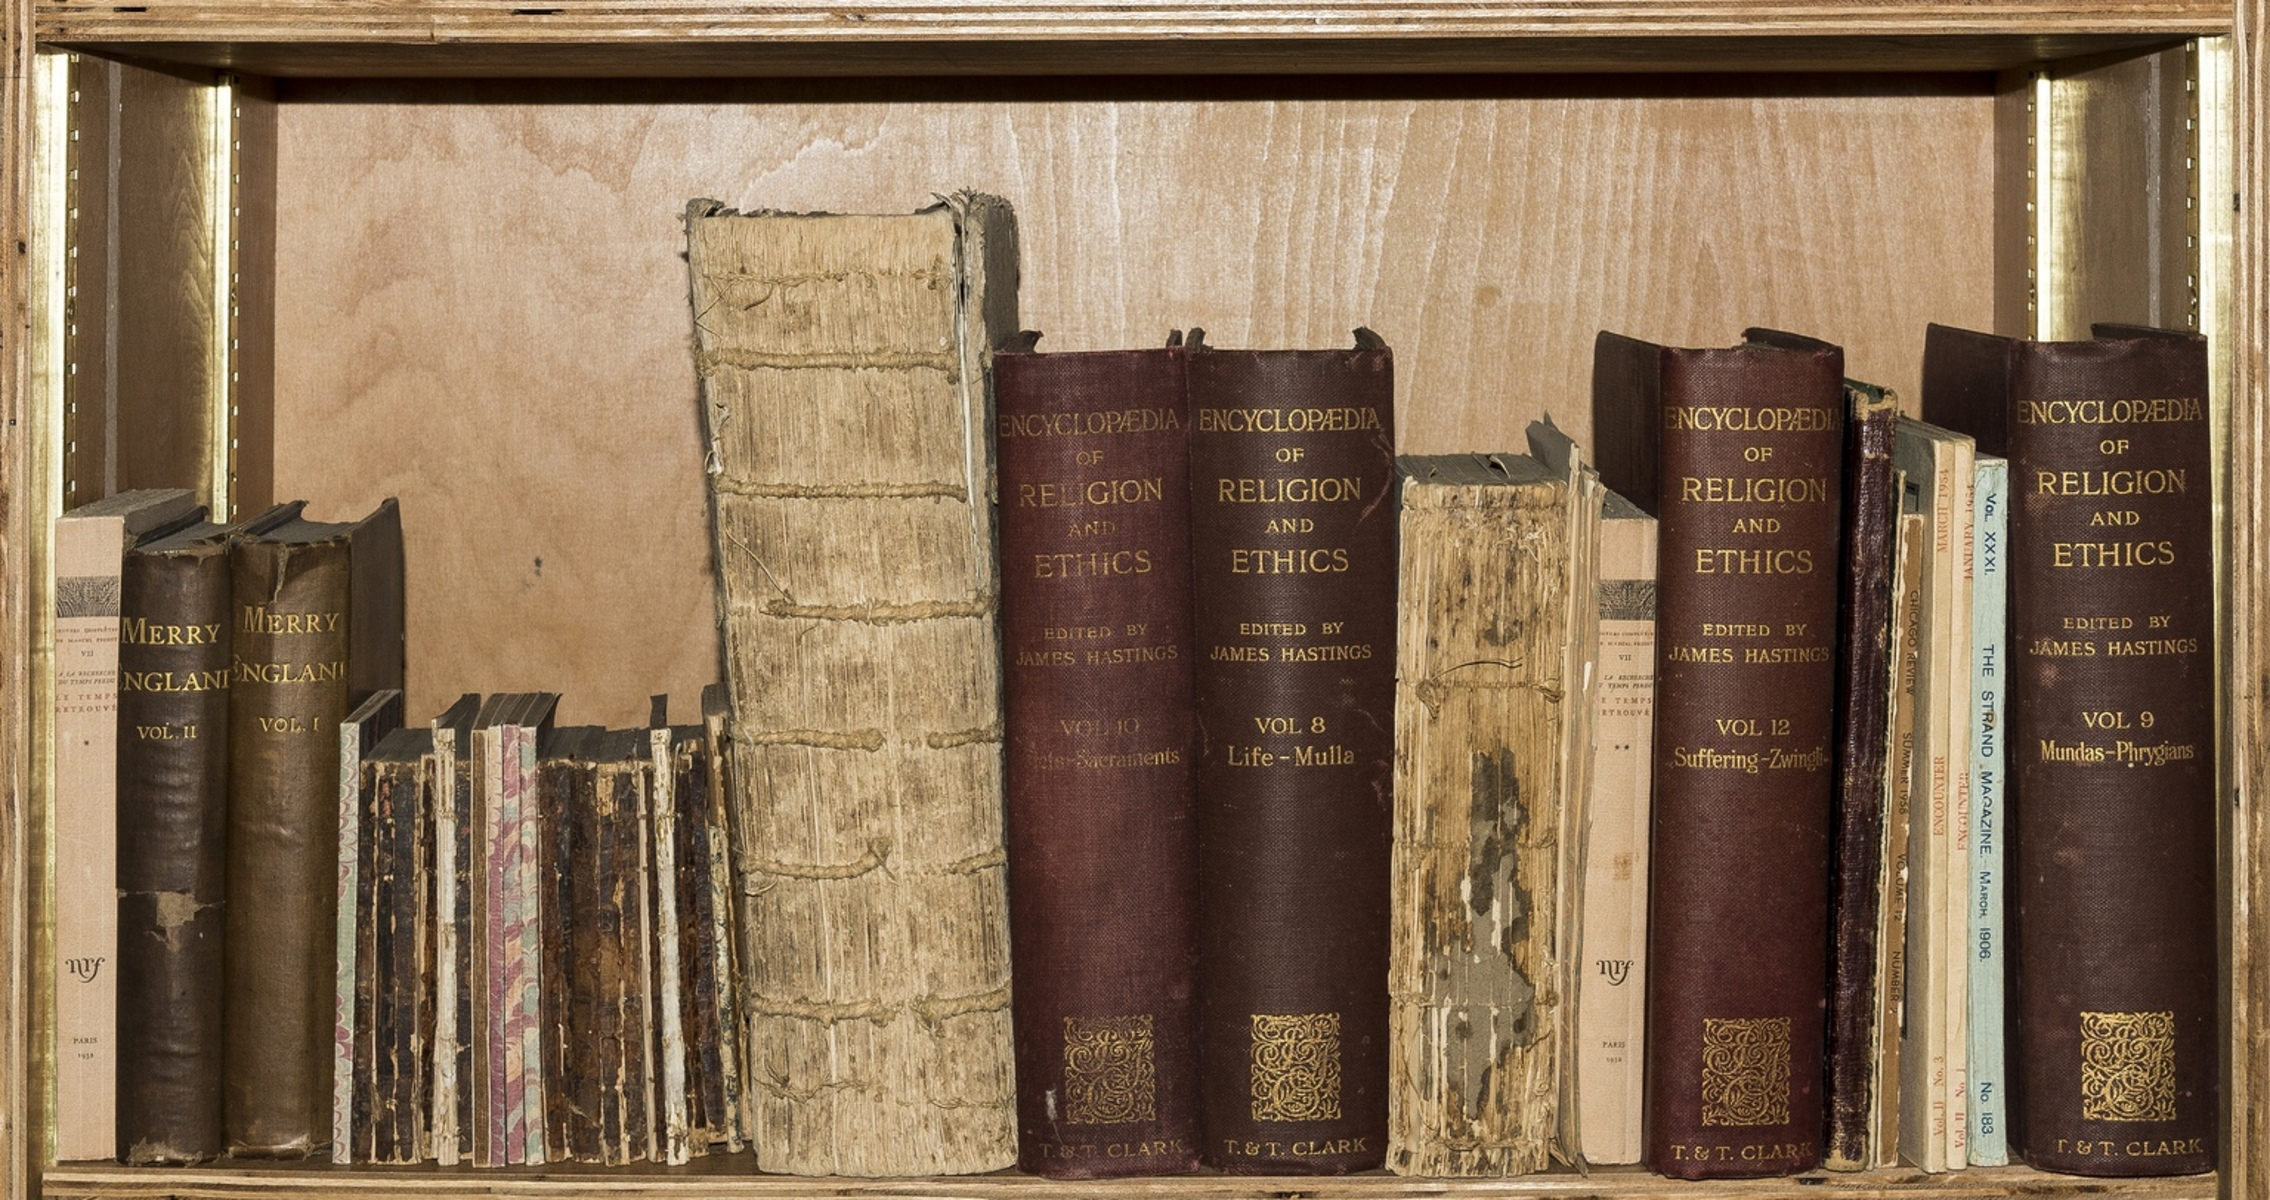 Shakespeare (William) Cymbeline, [c.1800]; and c.50 others (c.50)